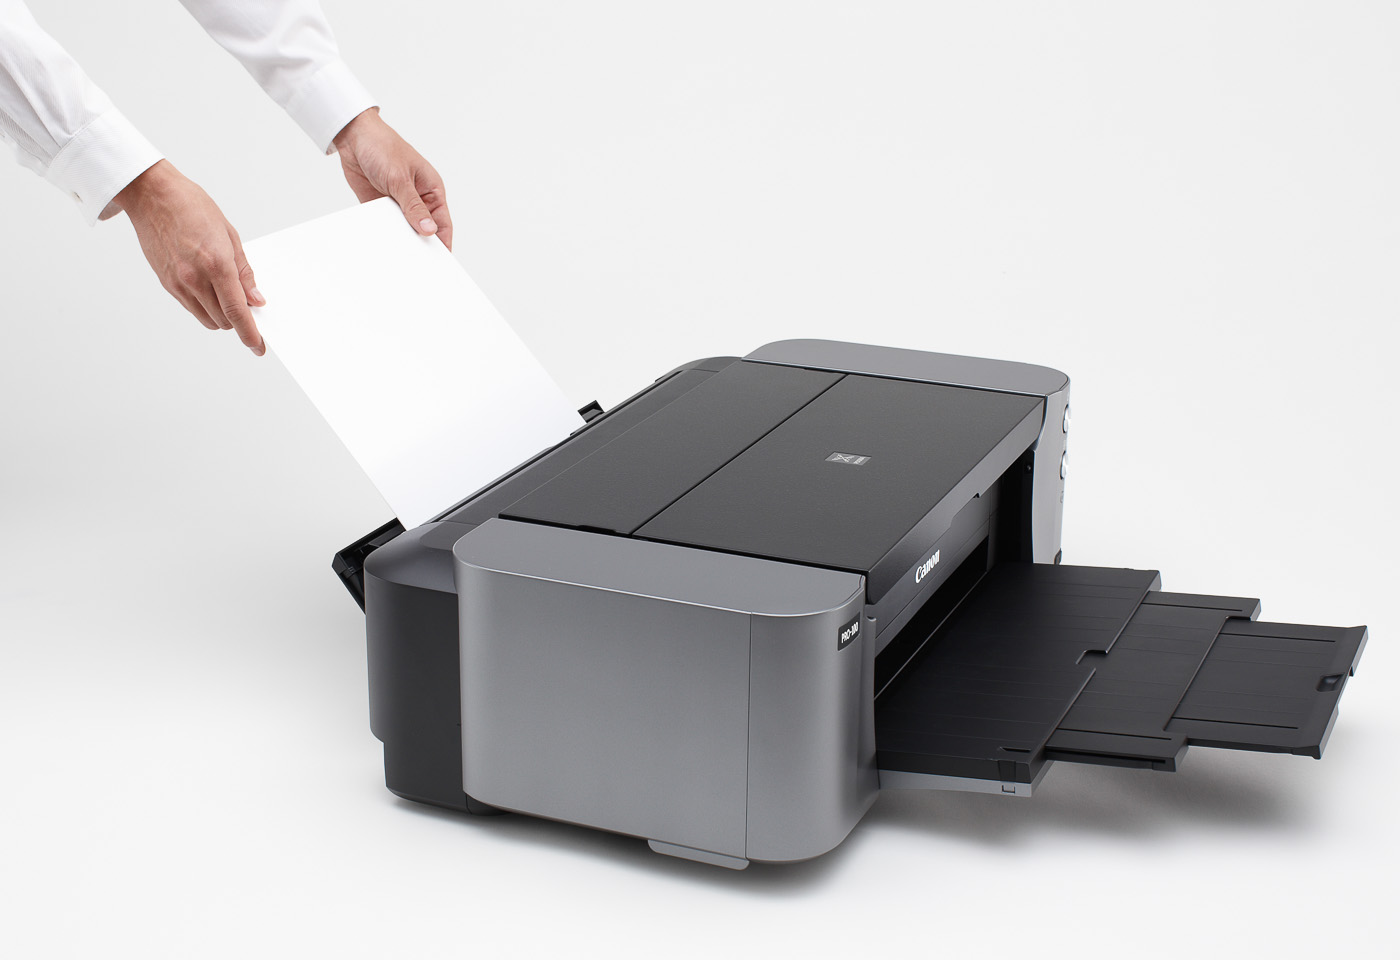 pixma pro 100 loading paper